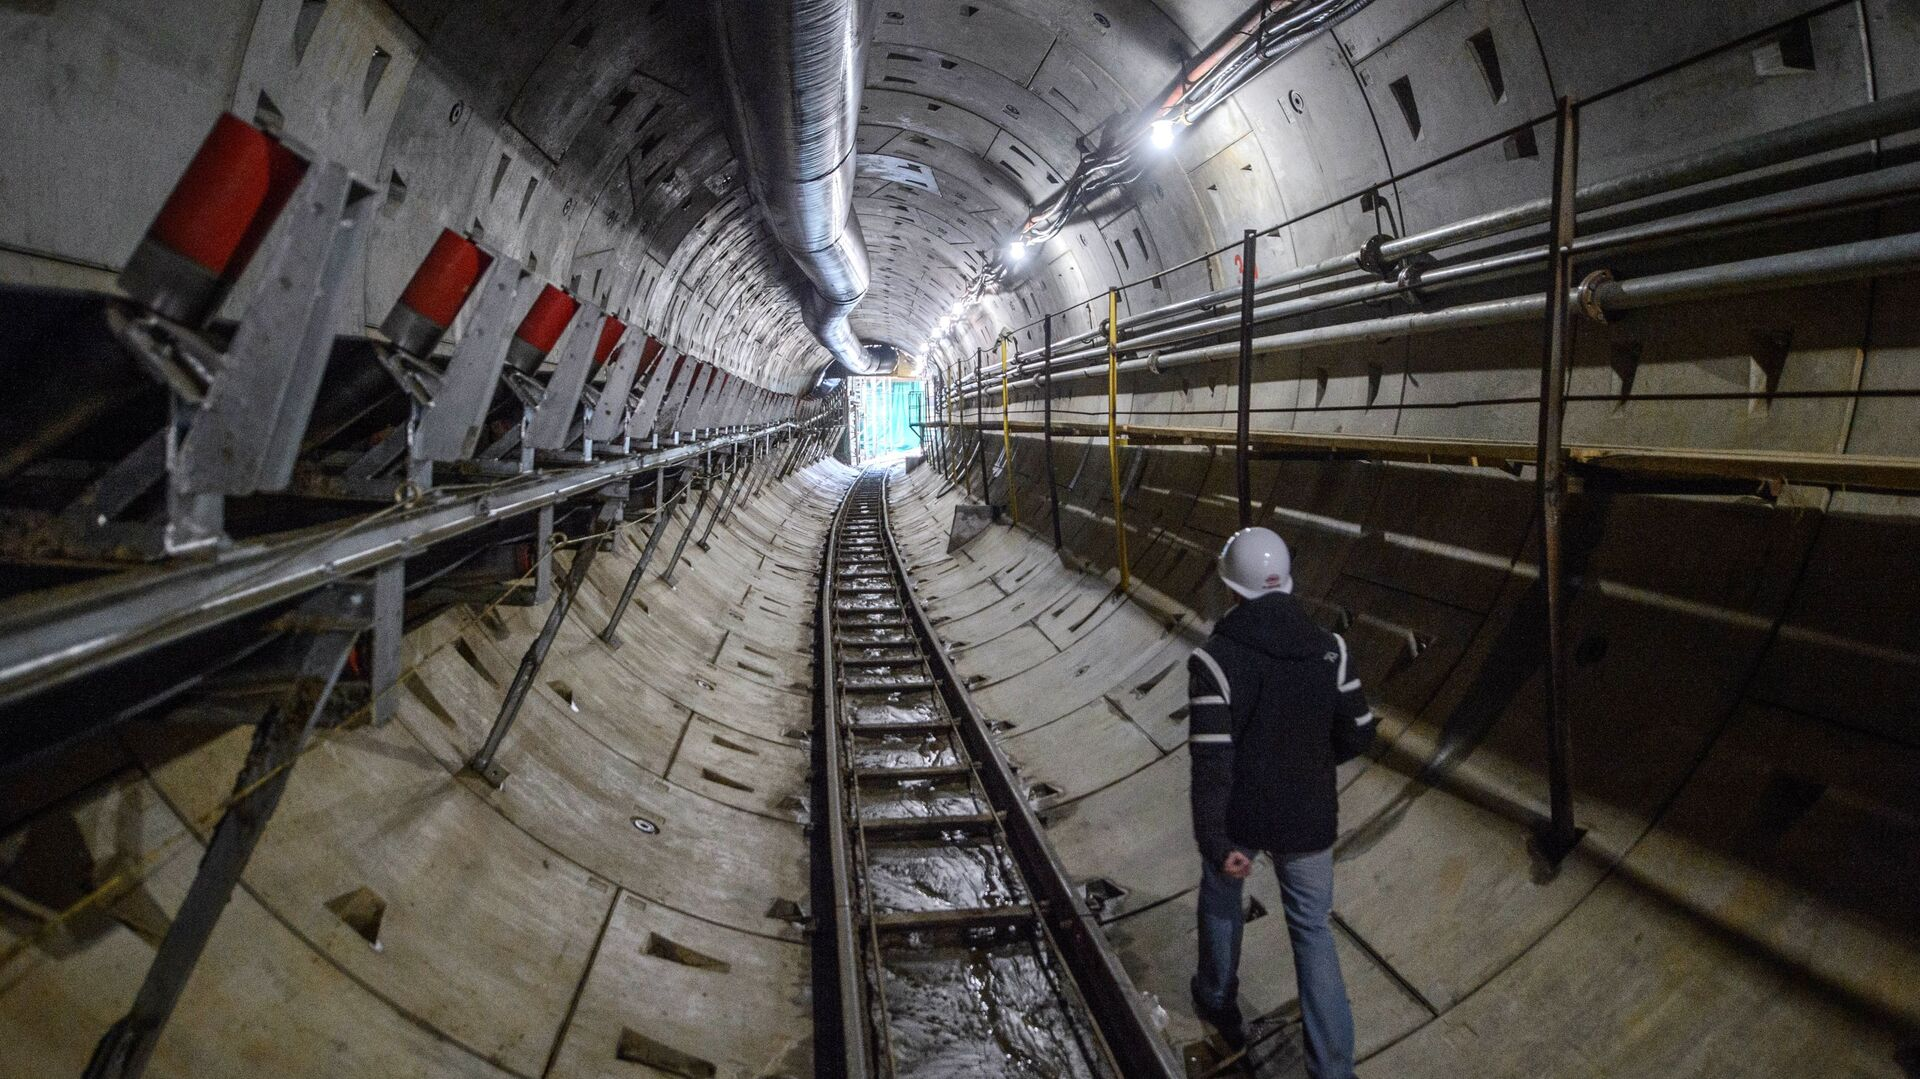 Строительство метро - РИА Новости, 1920, 28.06.2021